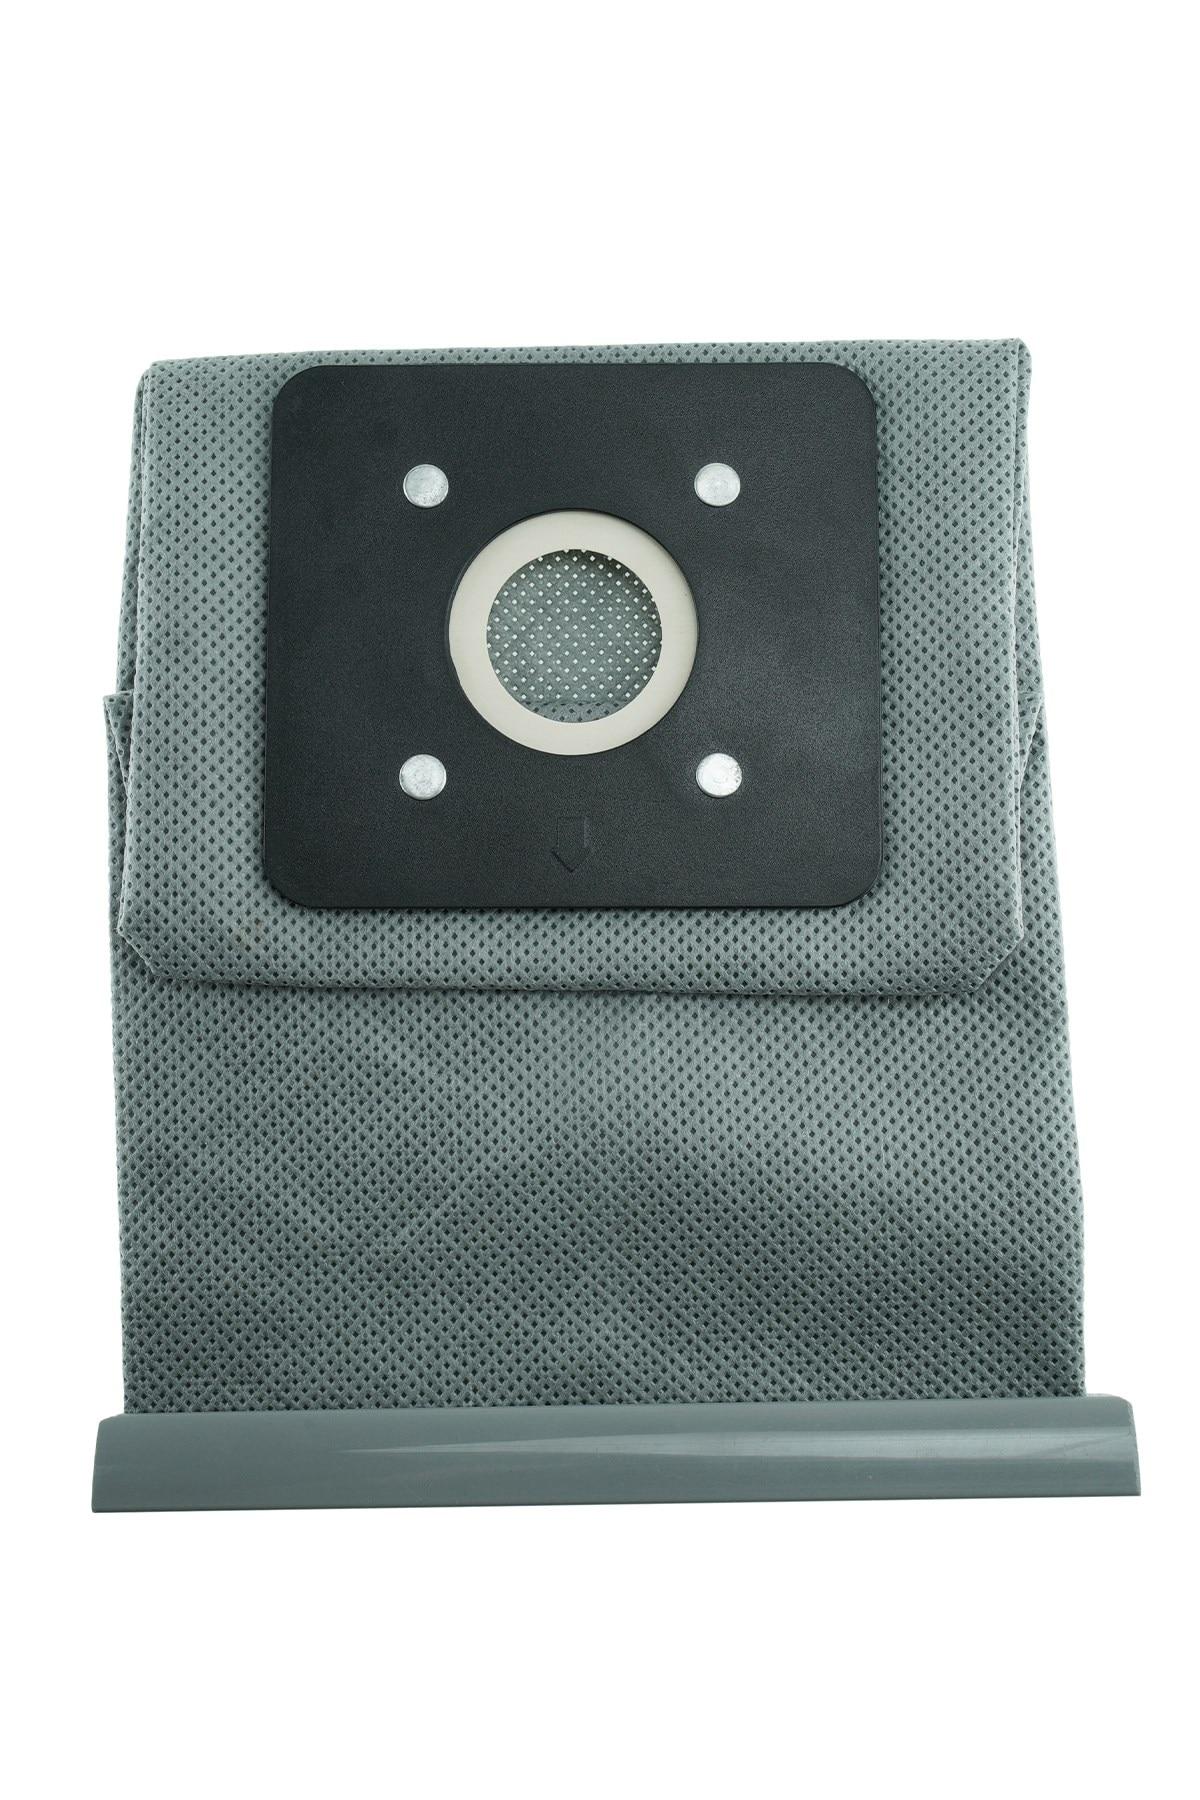 Aeg Smart 366, bolsa para polvo escurrible,